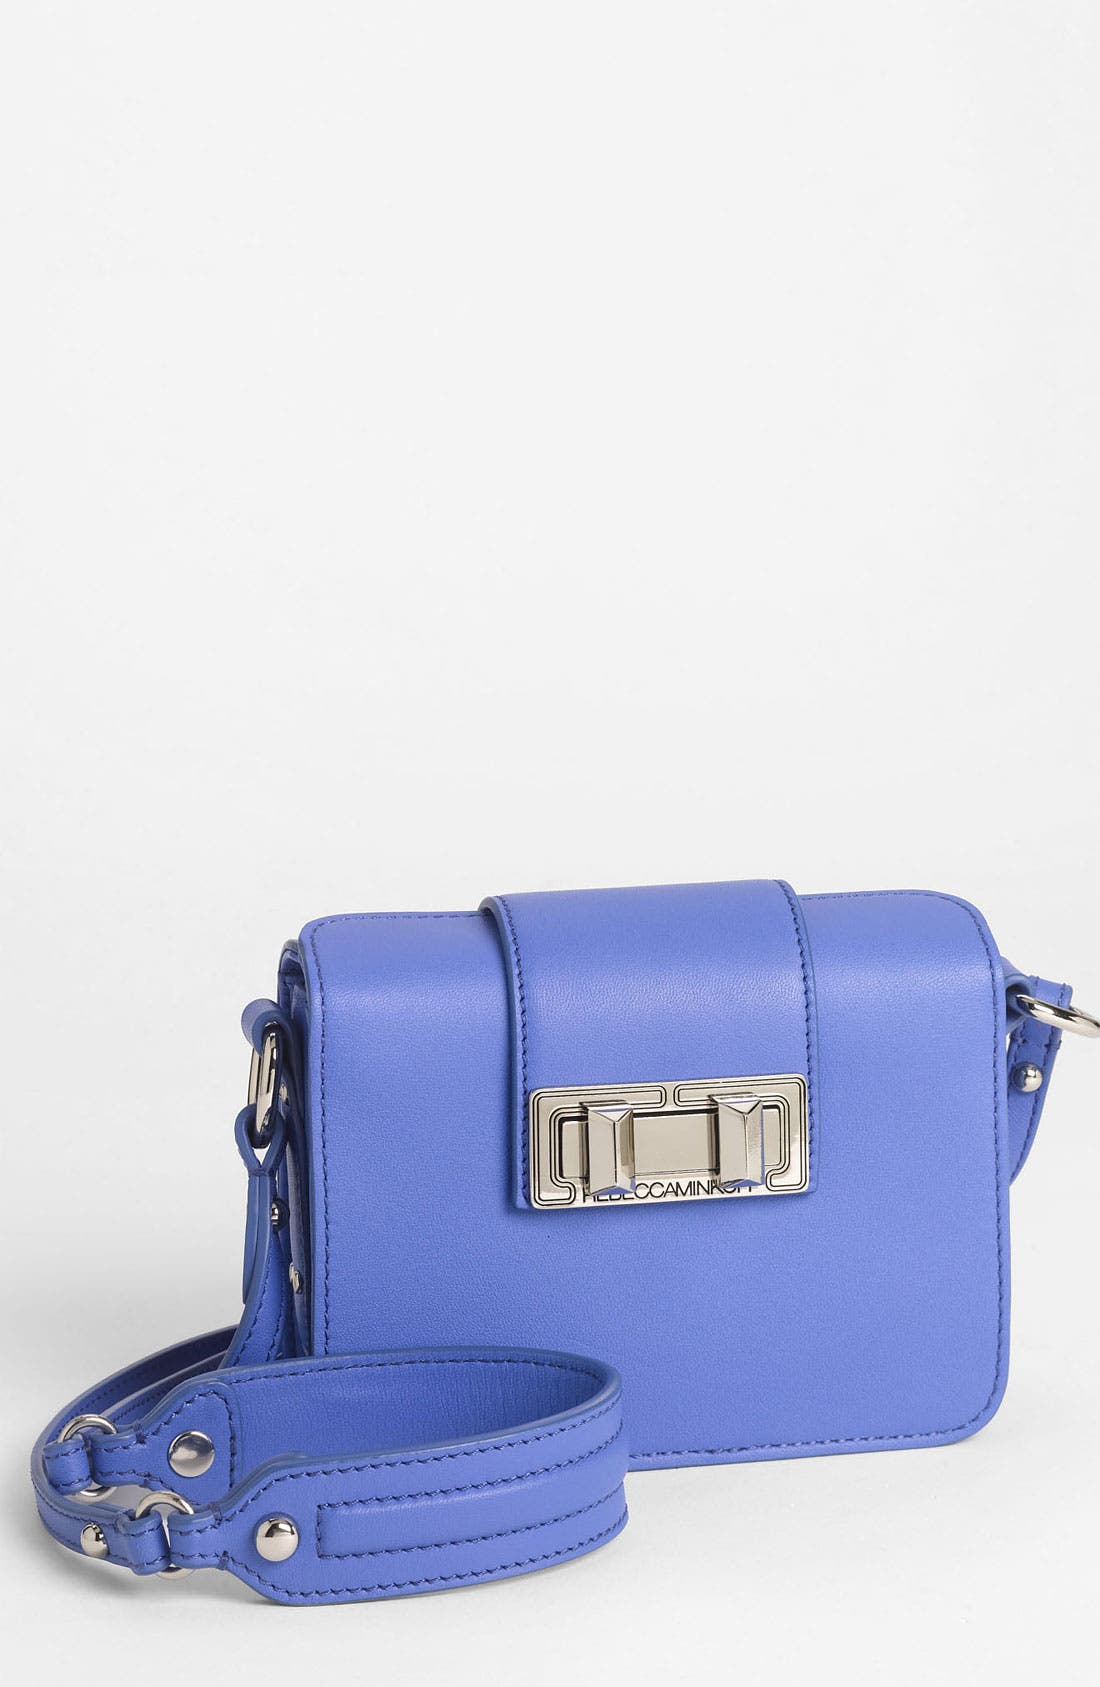 Alternate Image 1 Selected - Rebecca Minkoff 'Box - Mini' Crossbody Bag